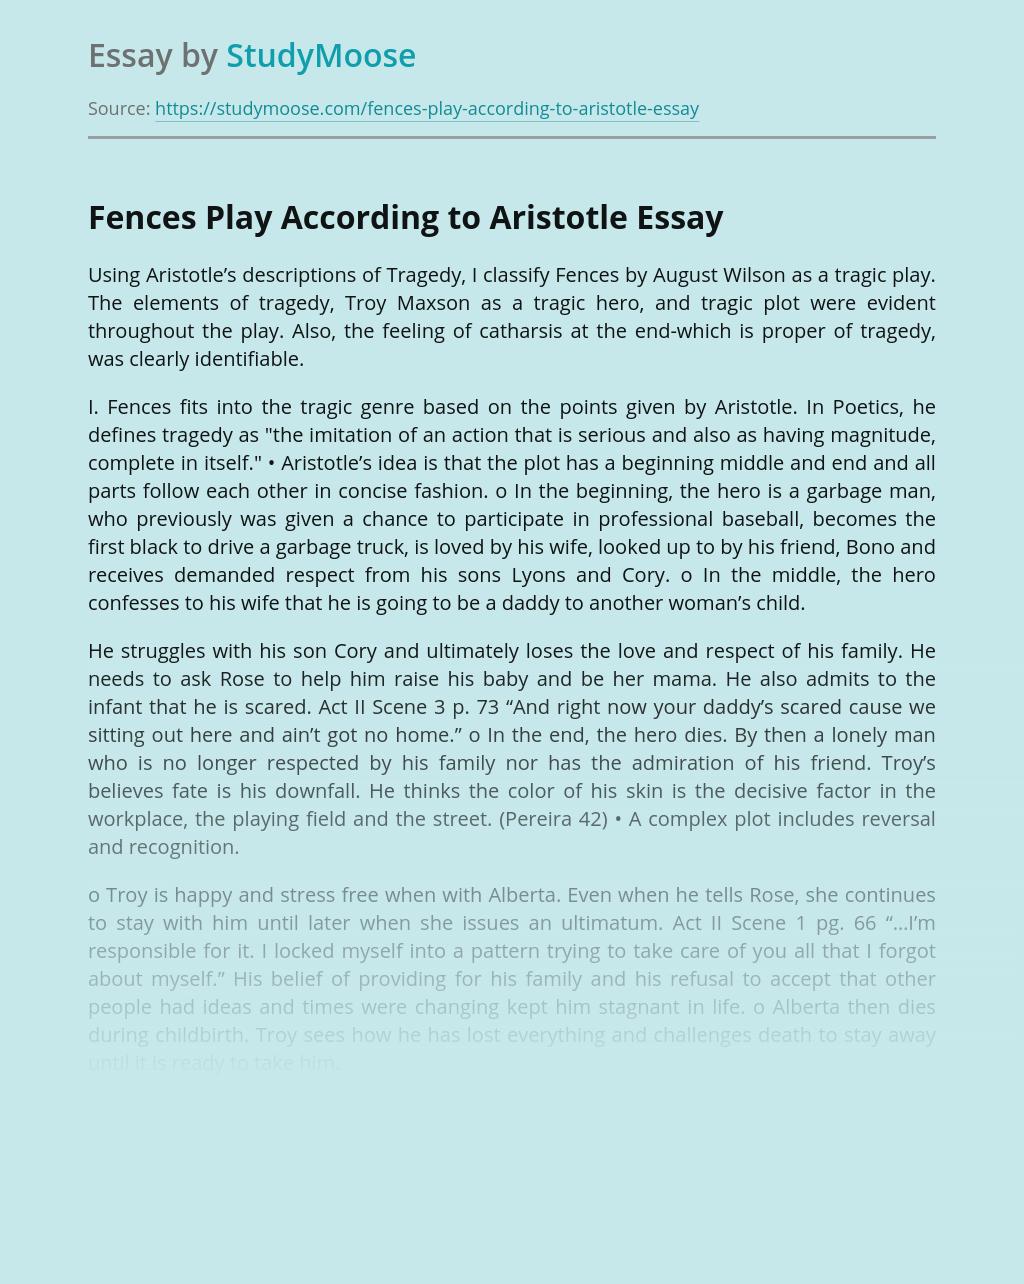 Fences Play According to Aristotle